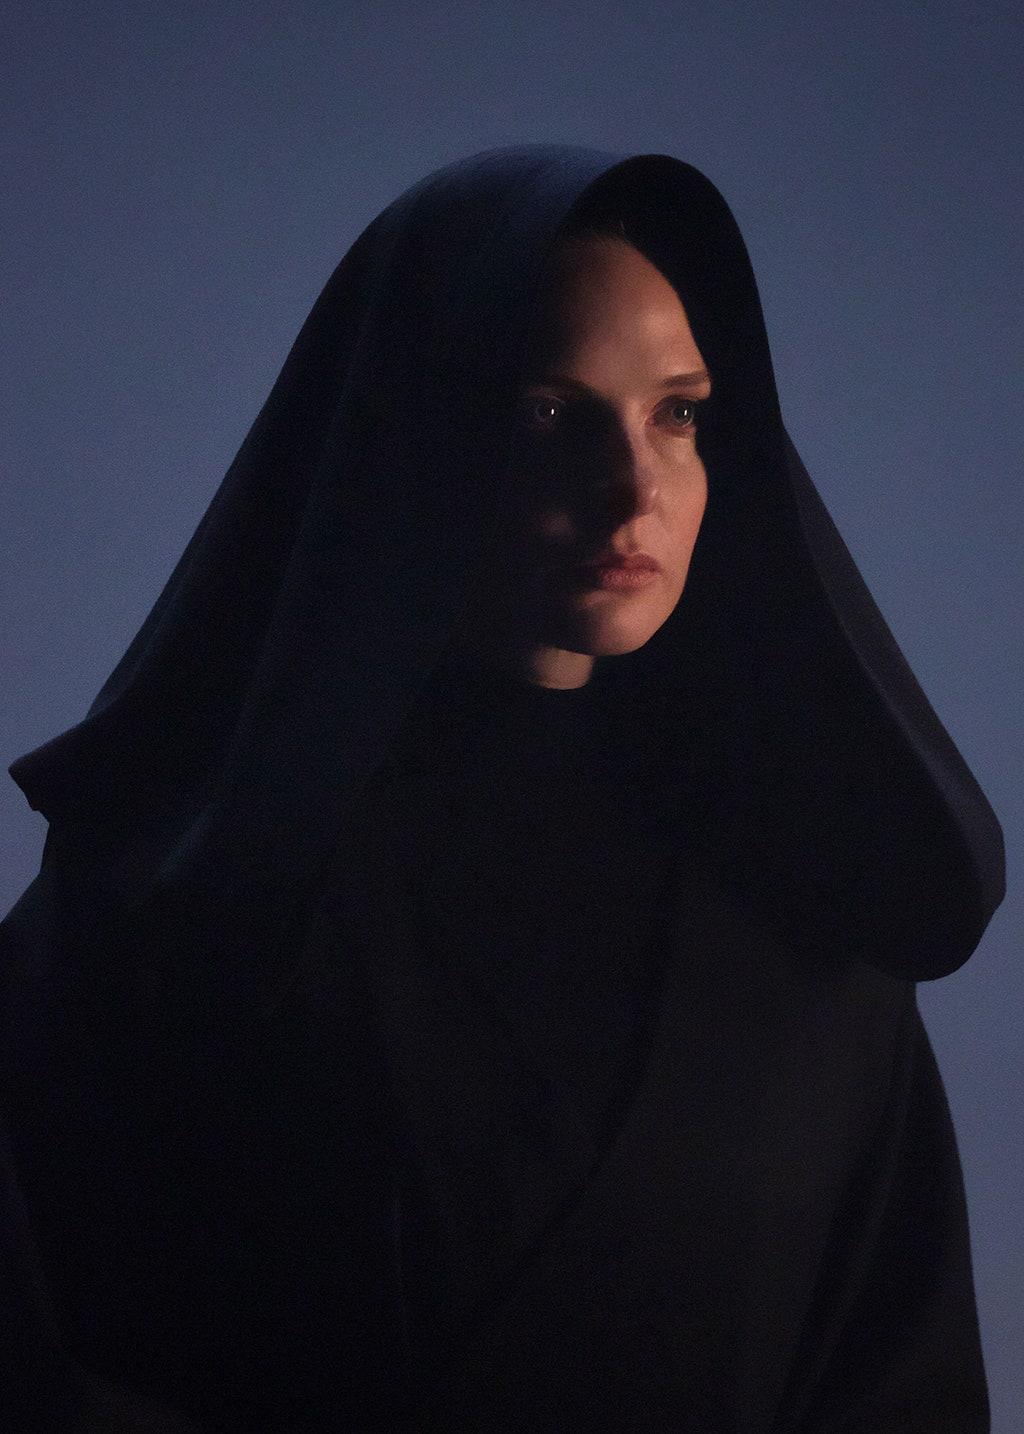 Rebecca Ferguson as Lady Jessica Atreides. PHOTO BY CHIABELLA JAMES.